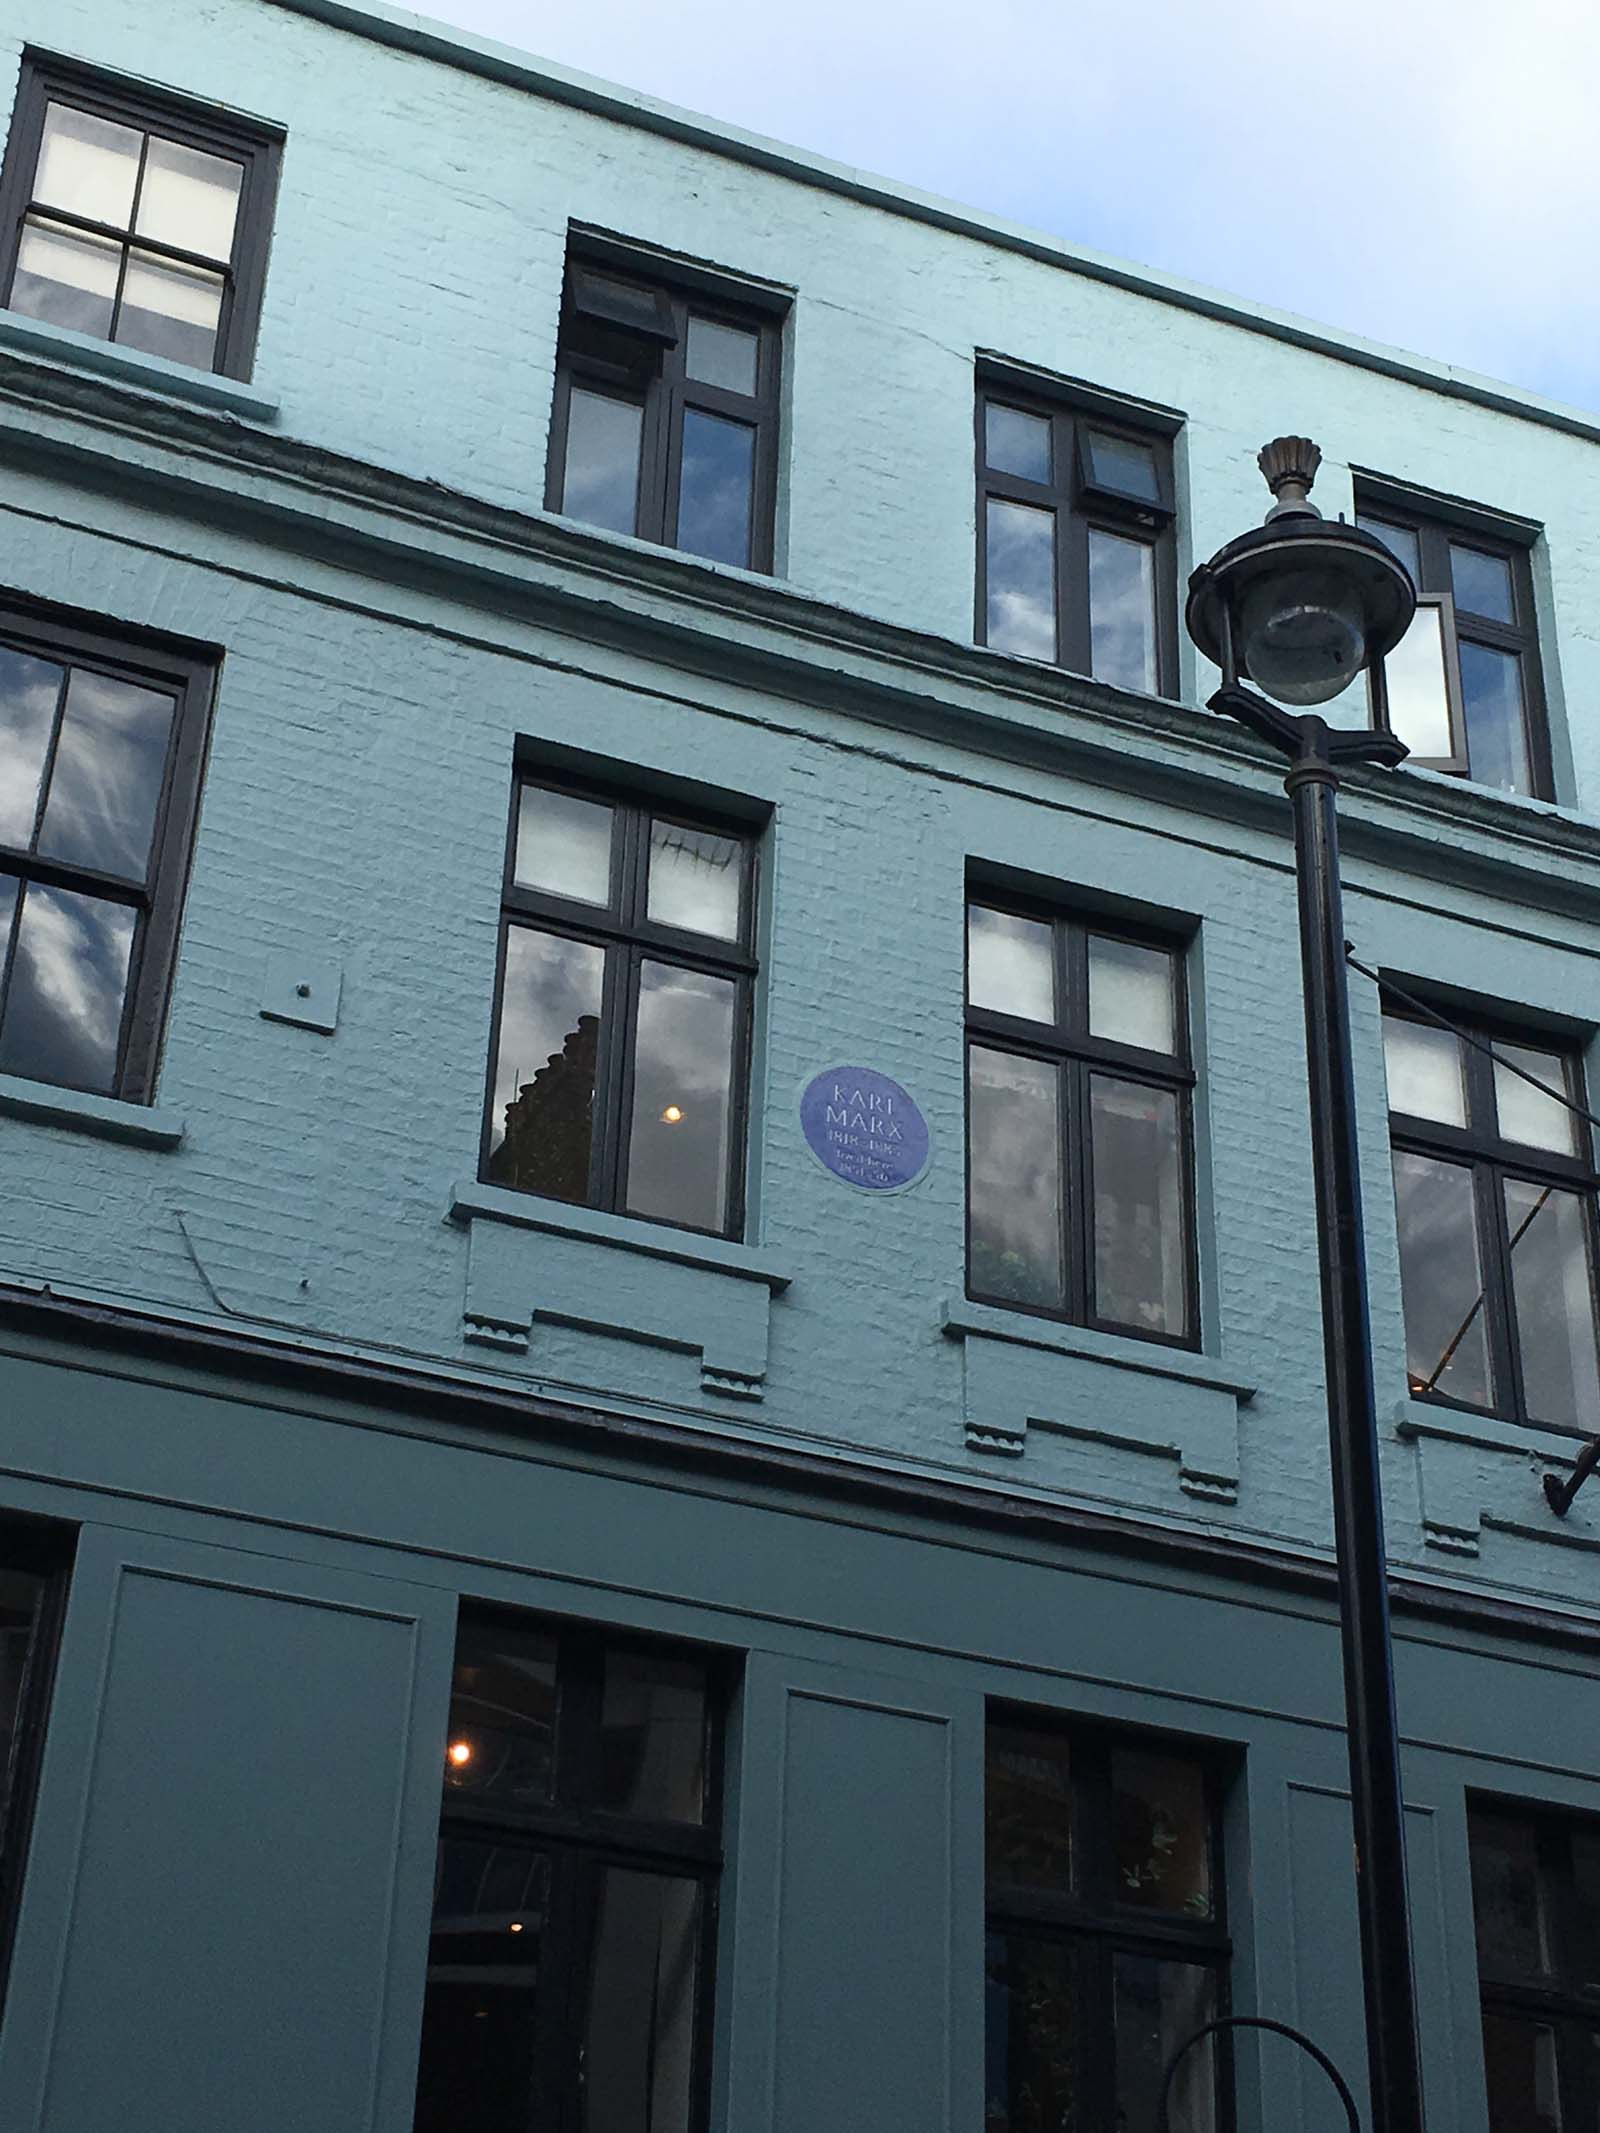 28-Dean-Street-London-Karl-Marx